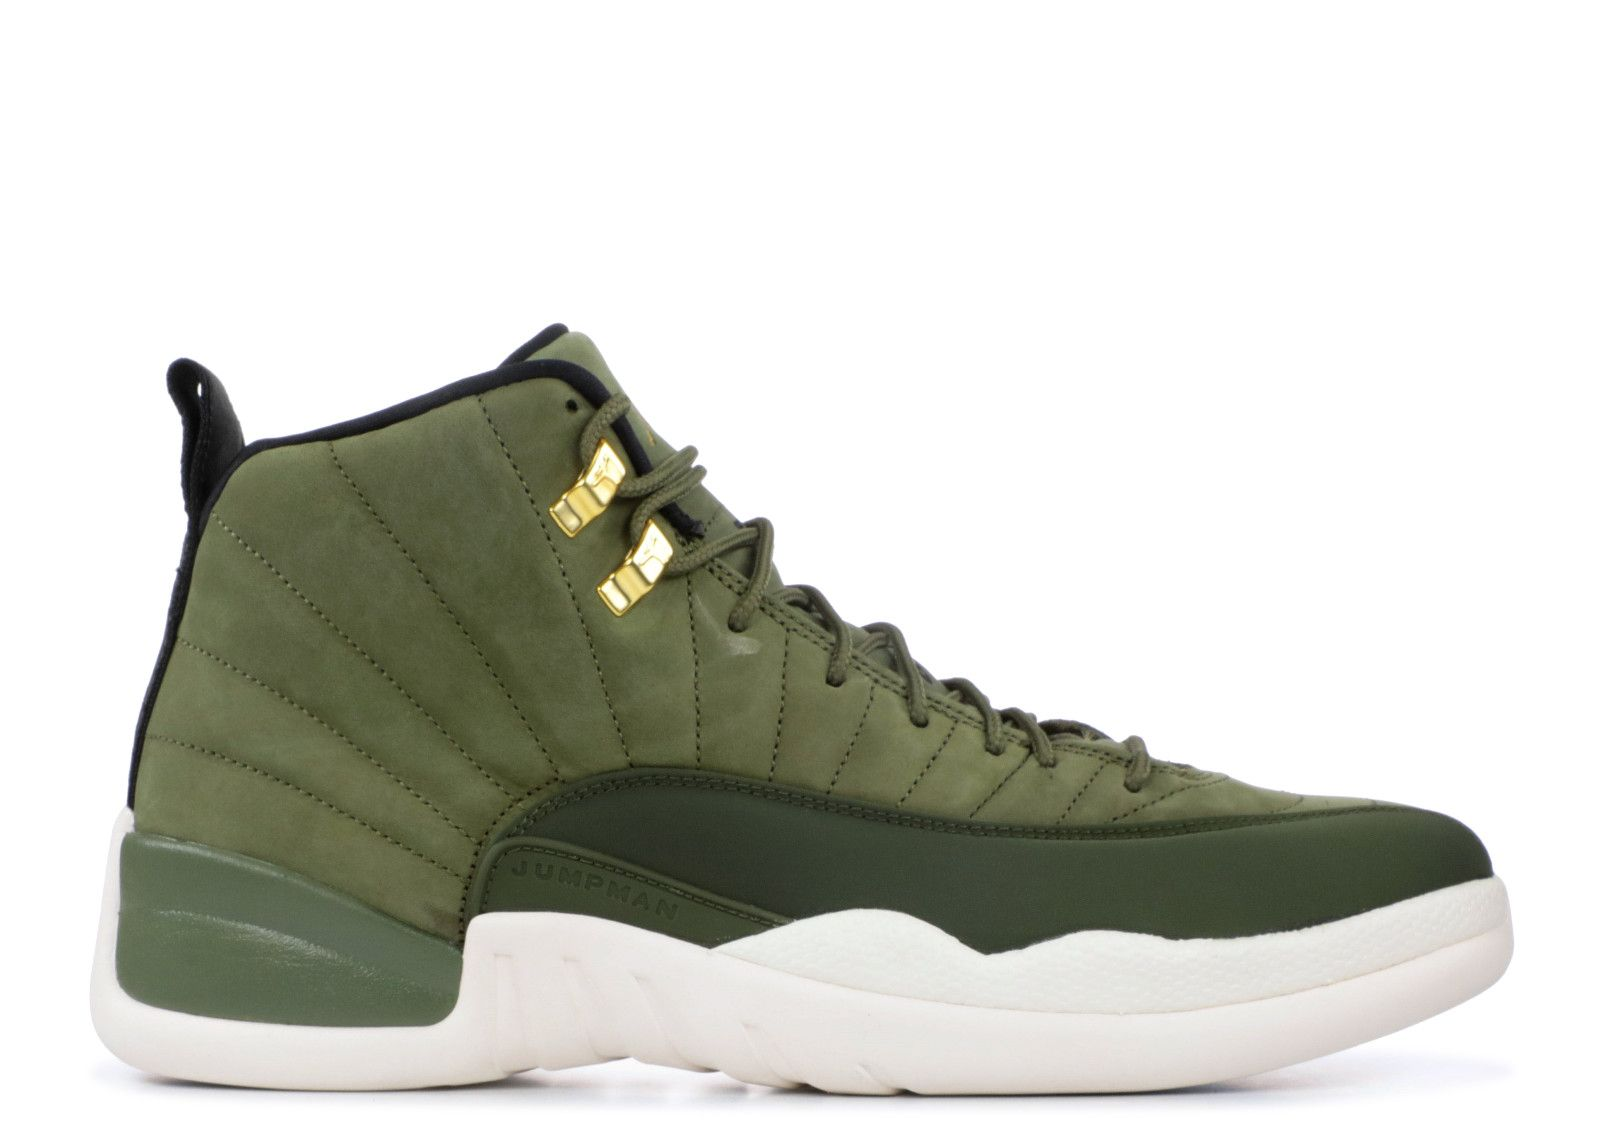 jordan retro 12 green where to buy